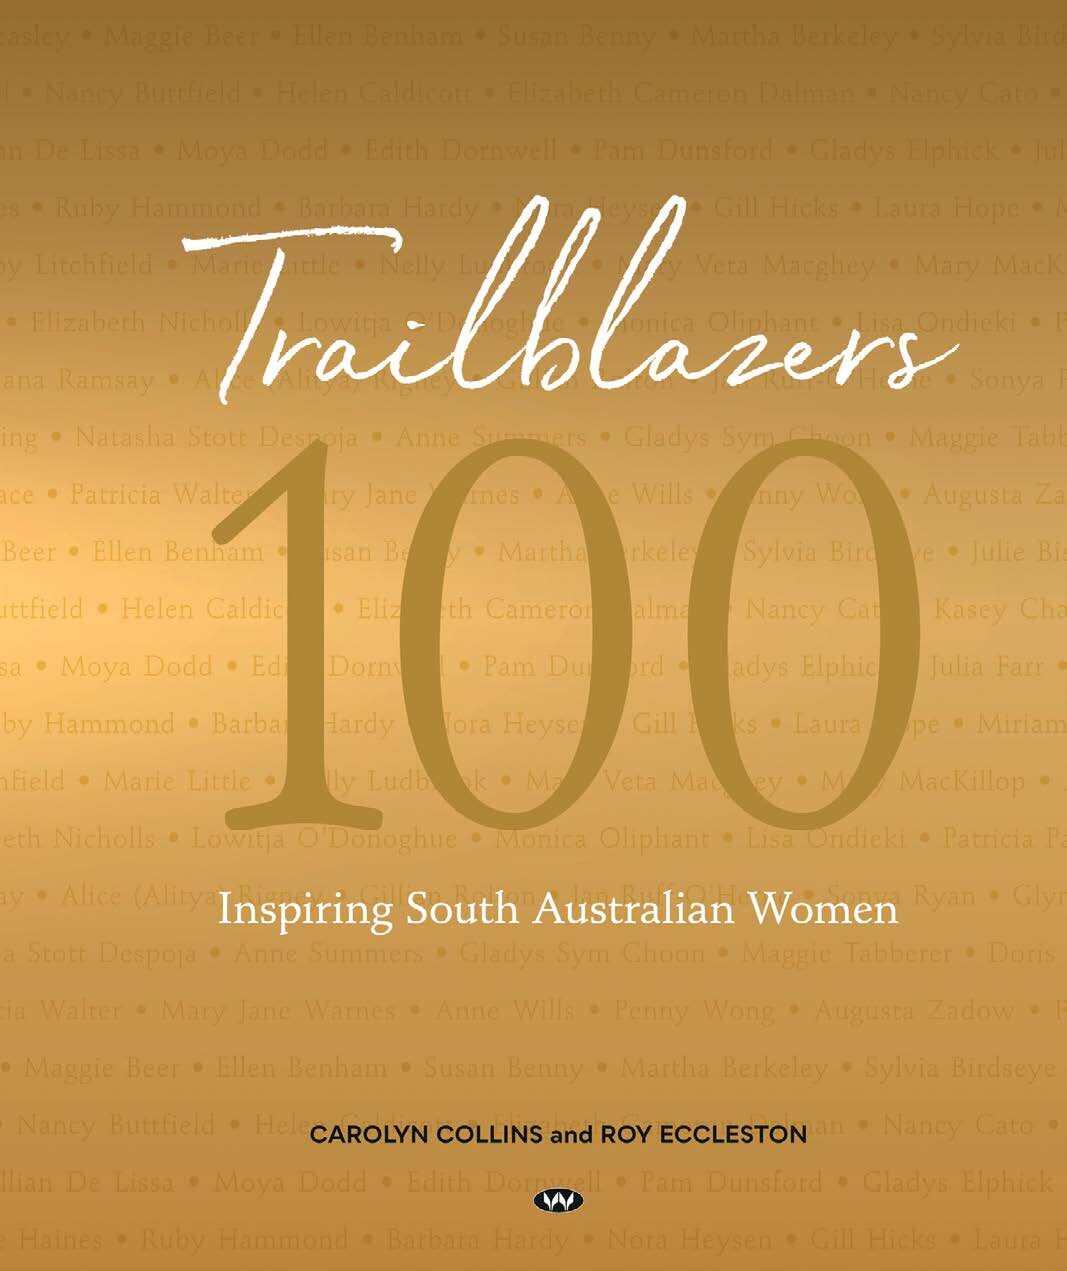 Page 8 of Trailblazers - 100 Inspiring South Australian Women